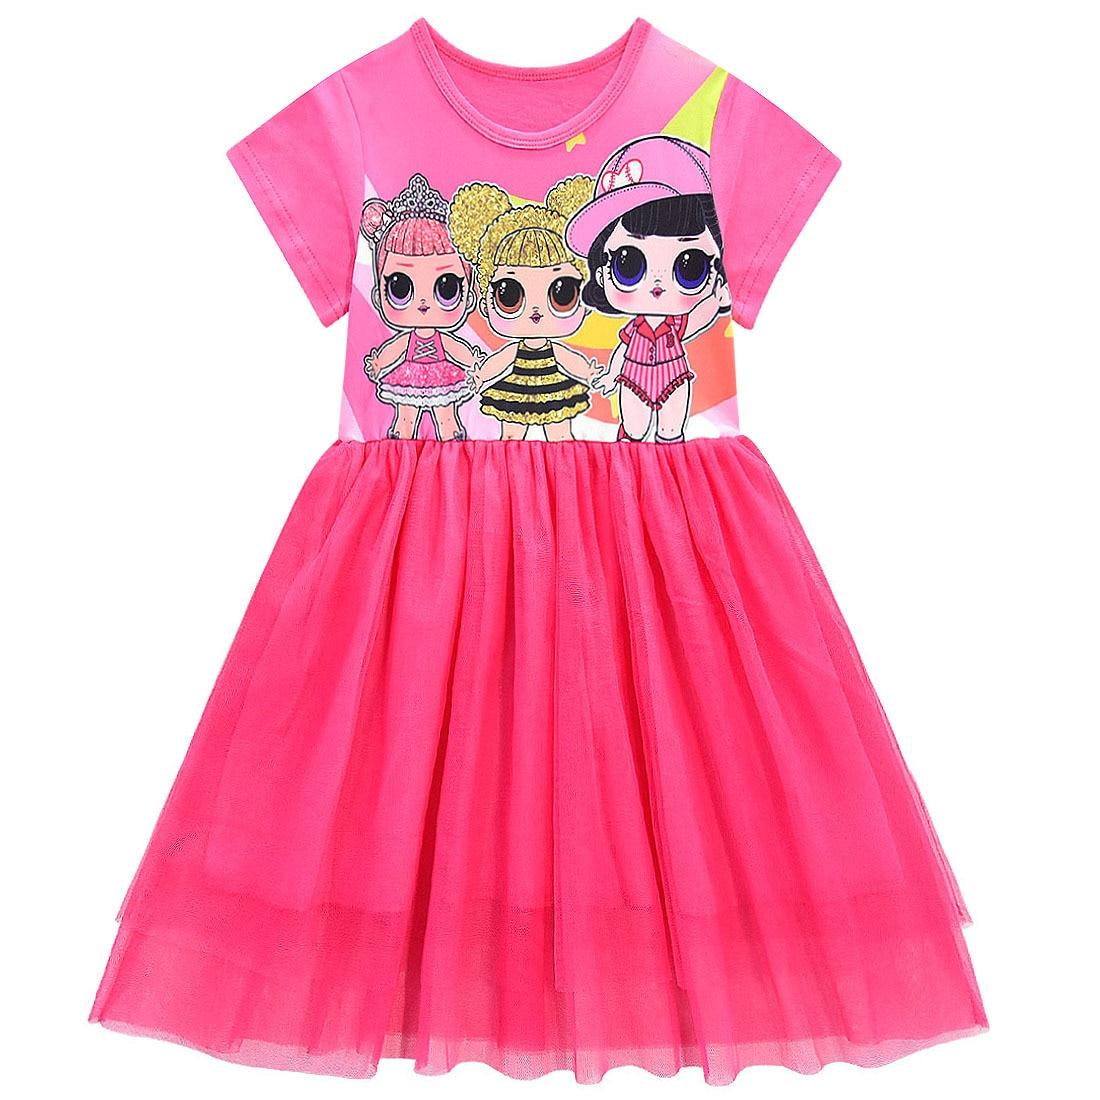 Girls Lol Dress Toddler Baby Lol Doll Clothes Kids Cartoon Print Princess Dress Children Short Sleeve Birthday Vestido for Girl 4